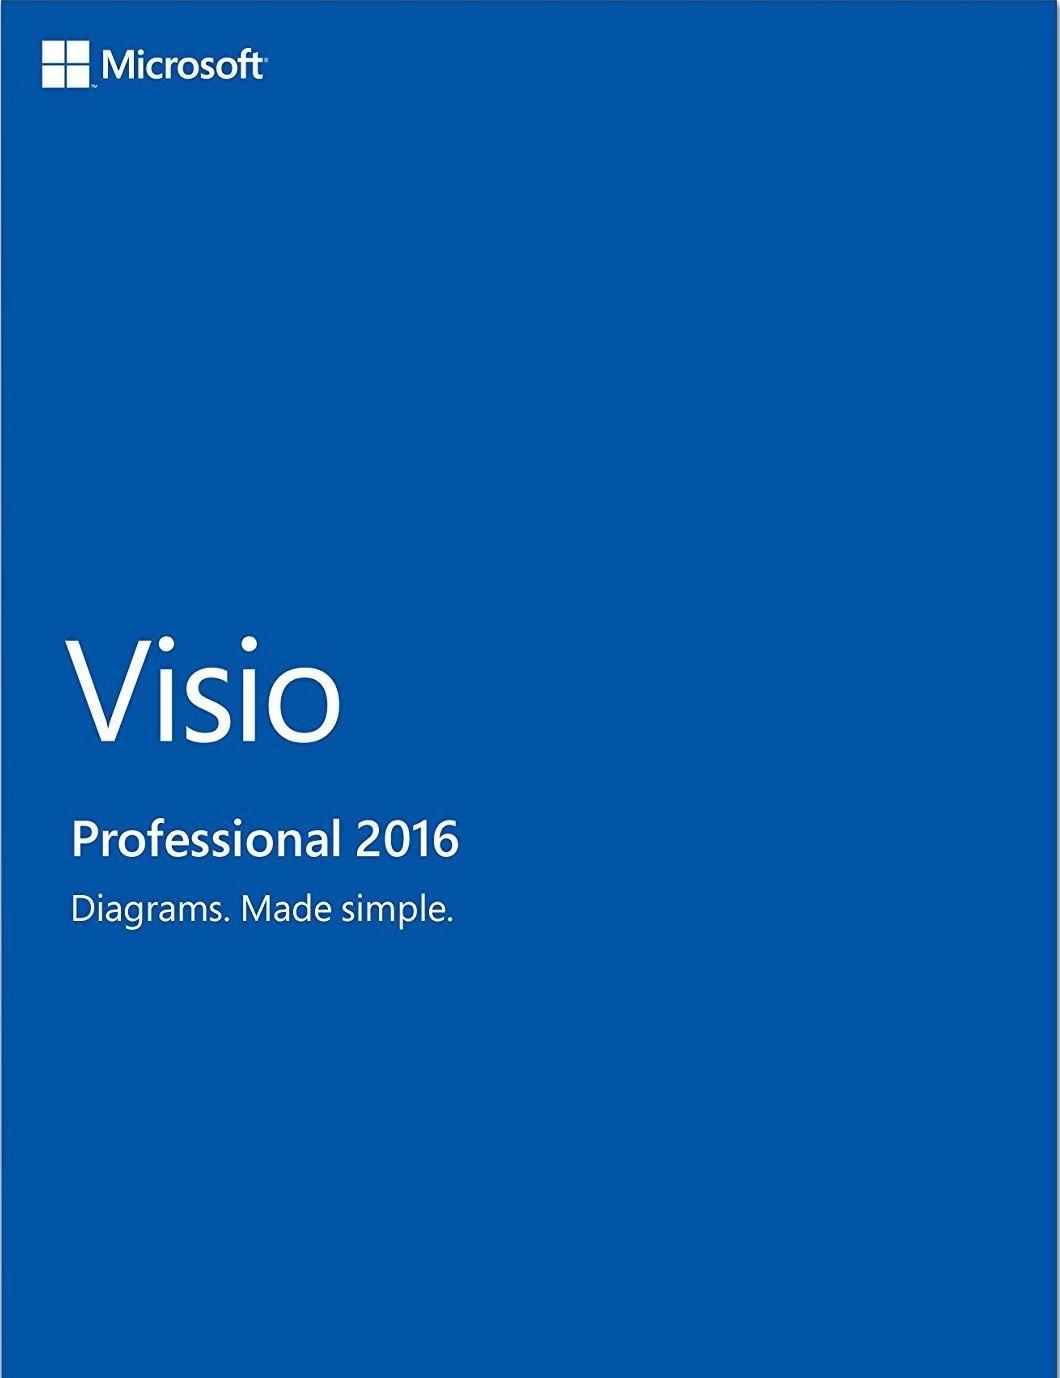 microsoft visio pro 2016 april 2017 x86x64 rahsal4free free download - Free Version Of Microsoft Visio